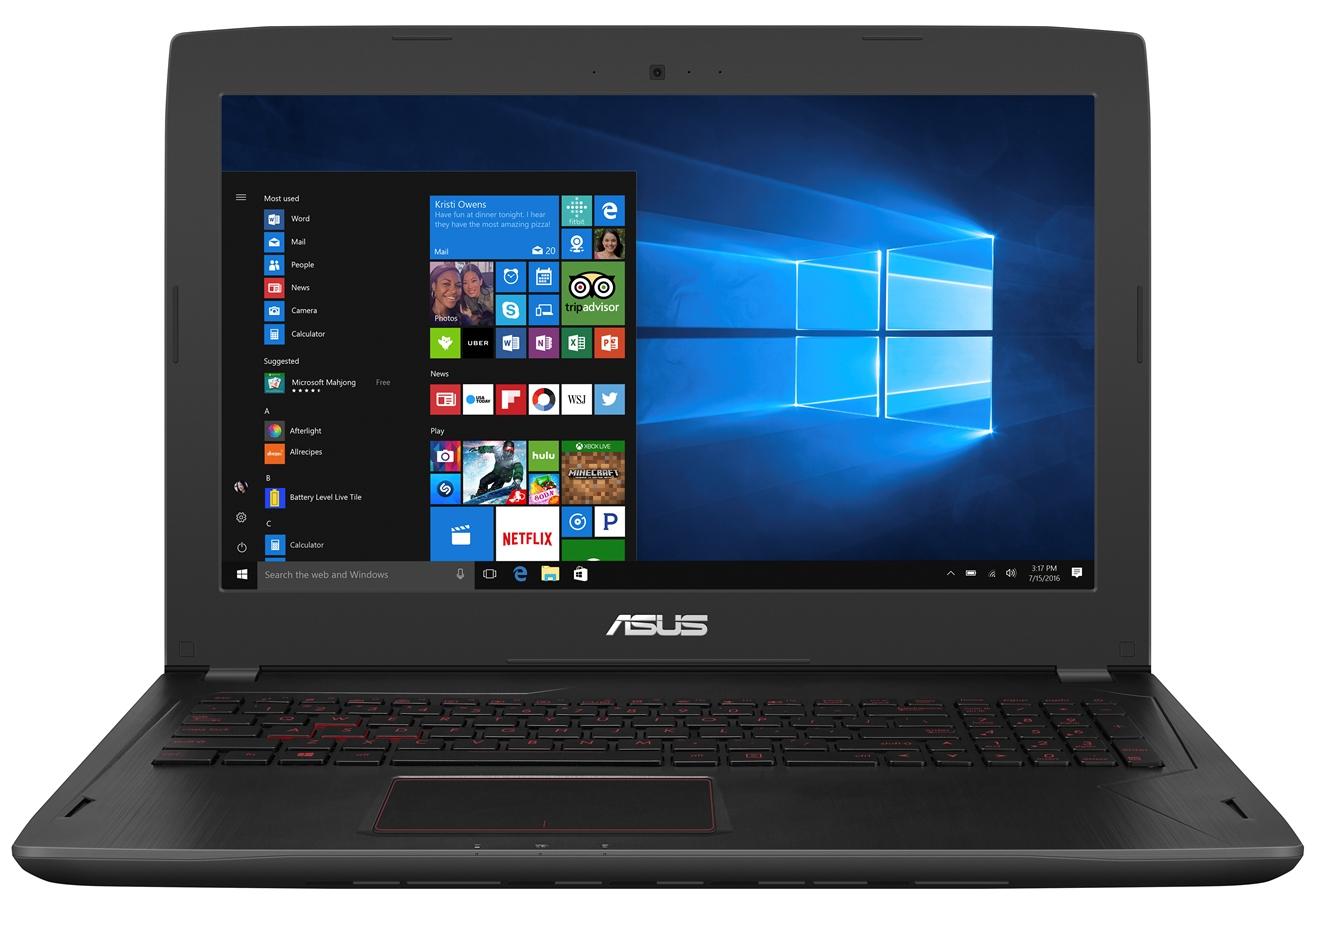 "ASUS FX502VE-FY047T i7-7700HQ/8G/1T 5400 ot./15,6"" IPS/FHD/W10/Black"